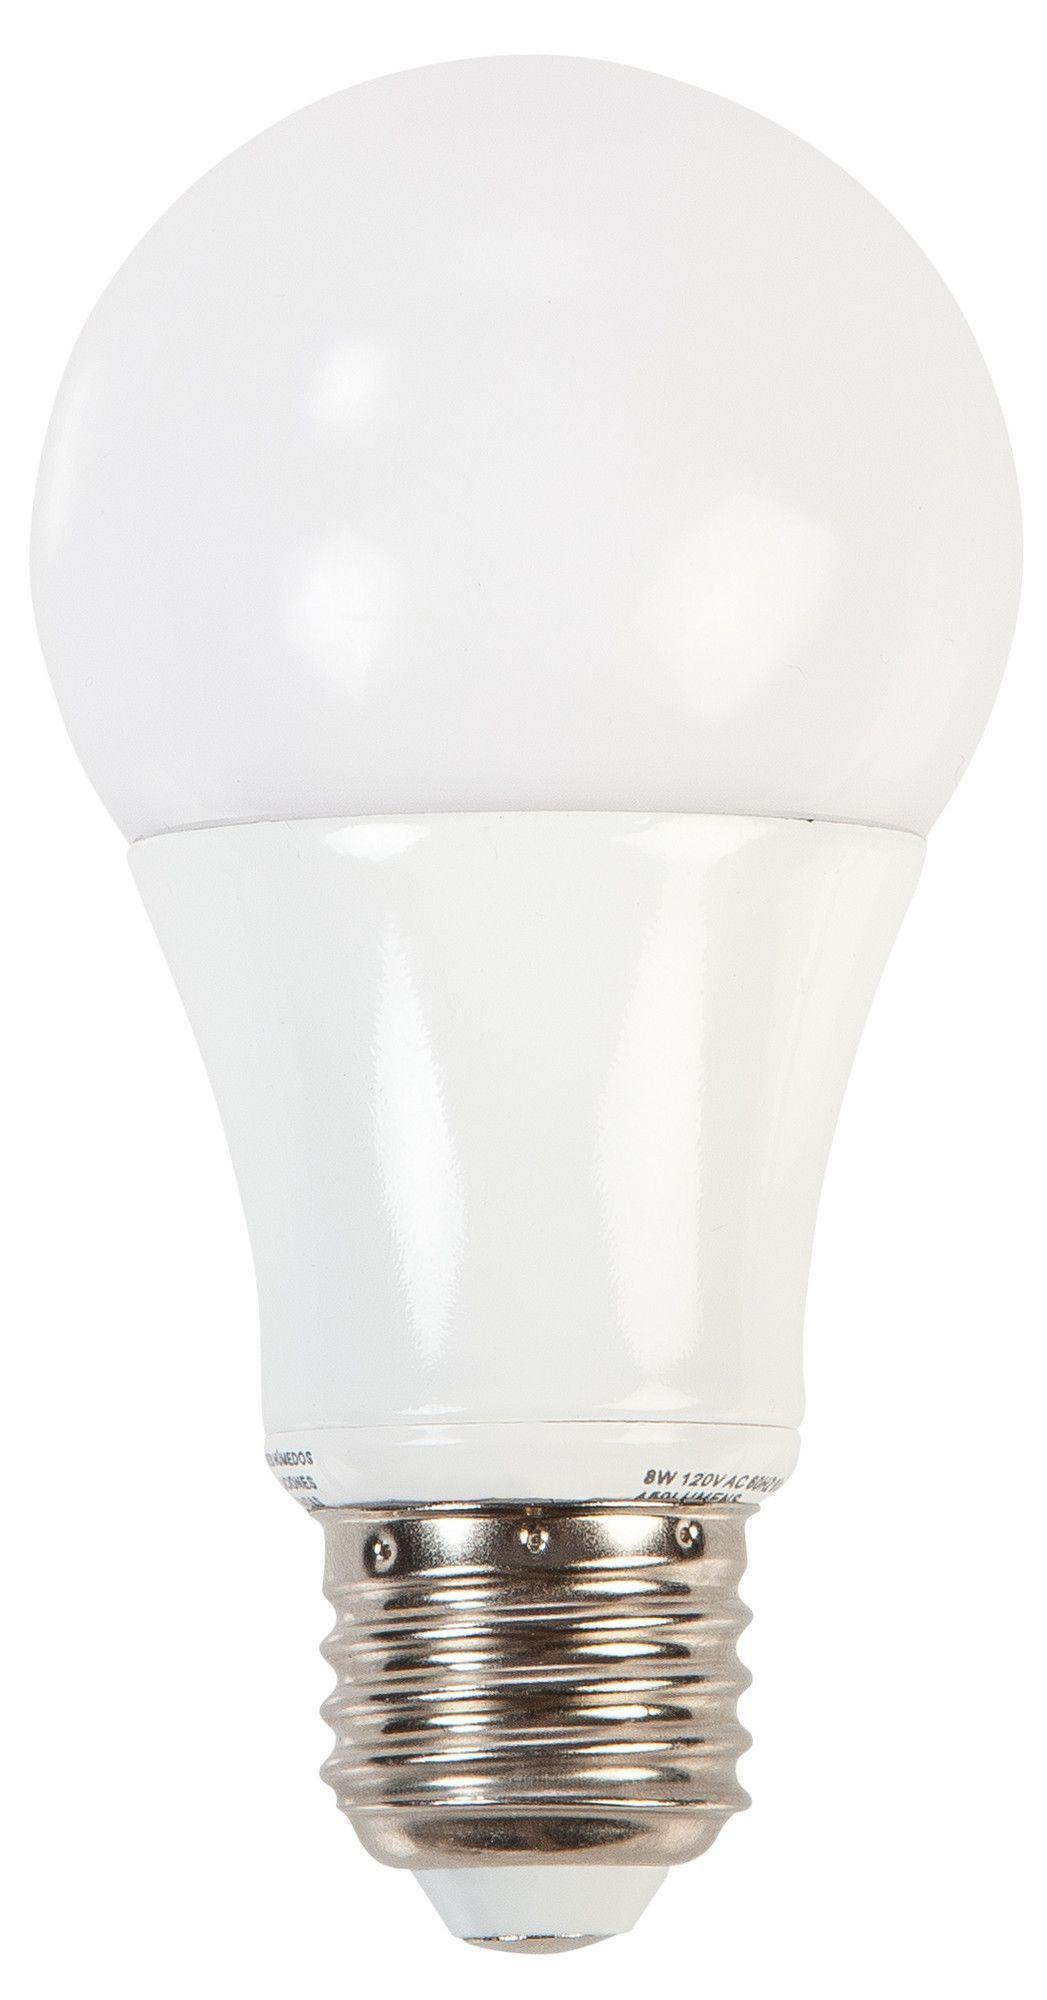 Ohyama 10W 120 Volt (2700K) Led Light Bulb